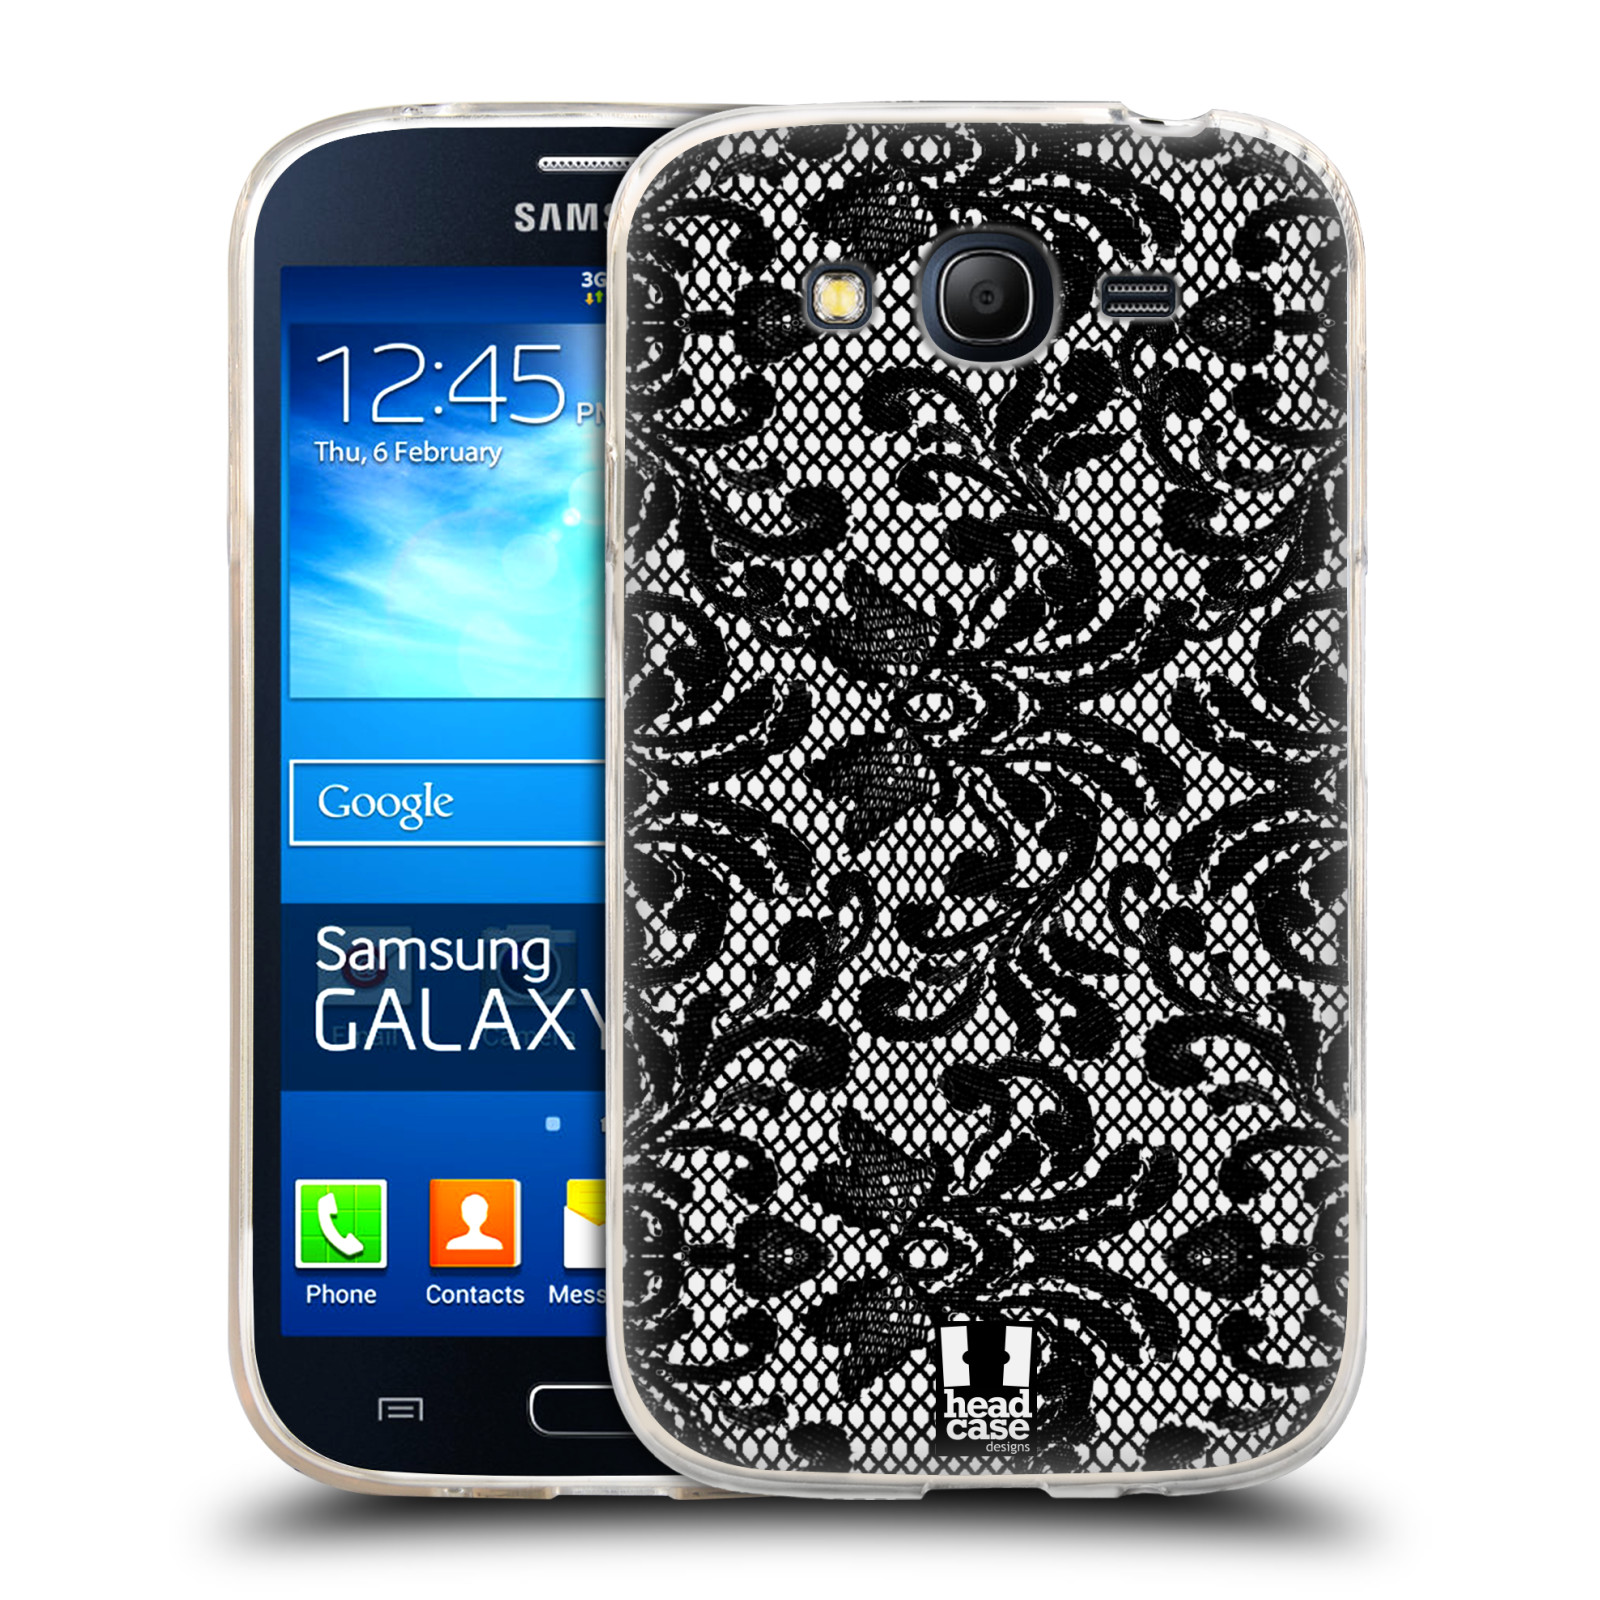 Silikonové pouzdro na mobil Samsung Galaxy Grand Neo Plus HEAD CASE KRAJKA (Silikonový kryt či obal na mobilní telefon Samsung Galaxy Grand Neo Plus Duos GT-I9060i)